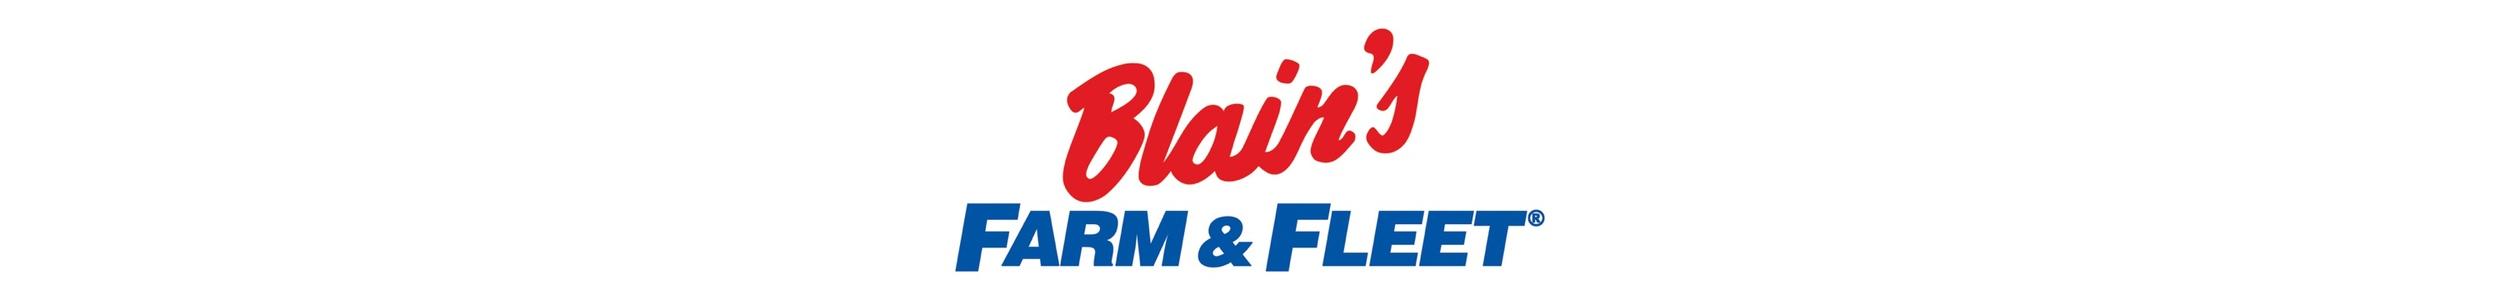 1-BlainsFarmFleet2.jpg